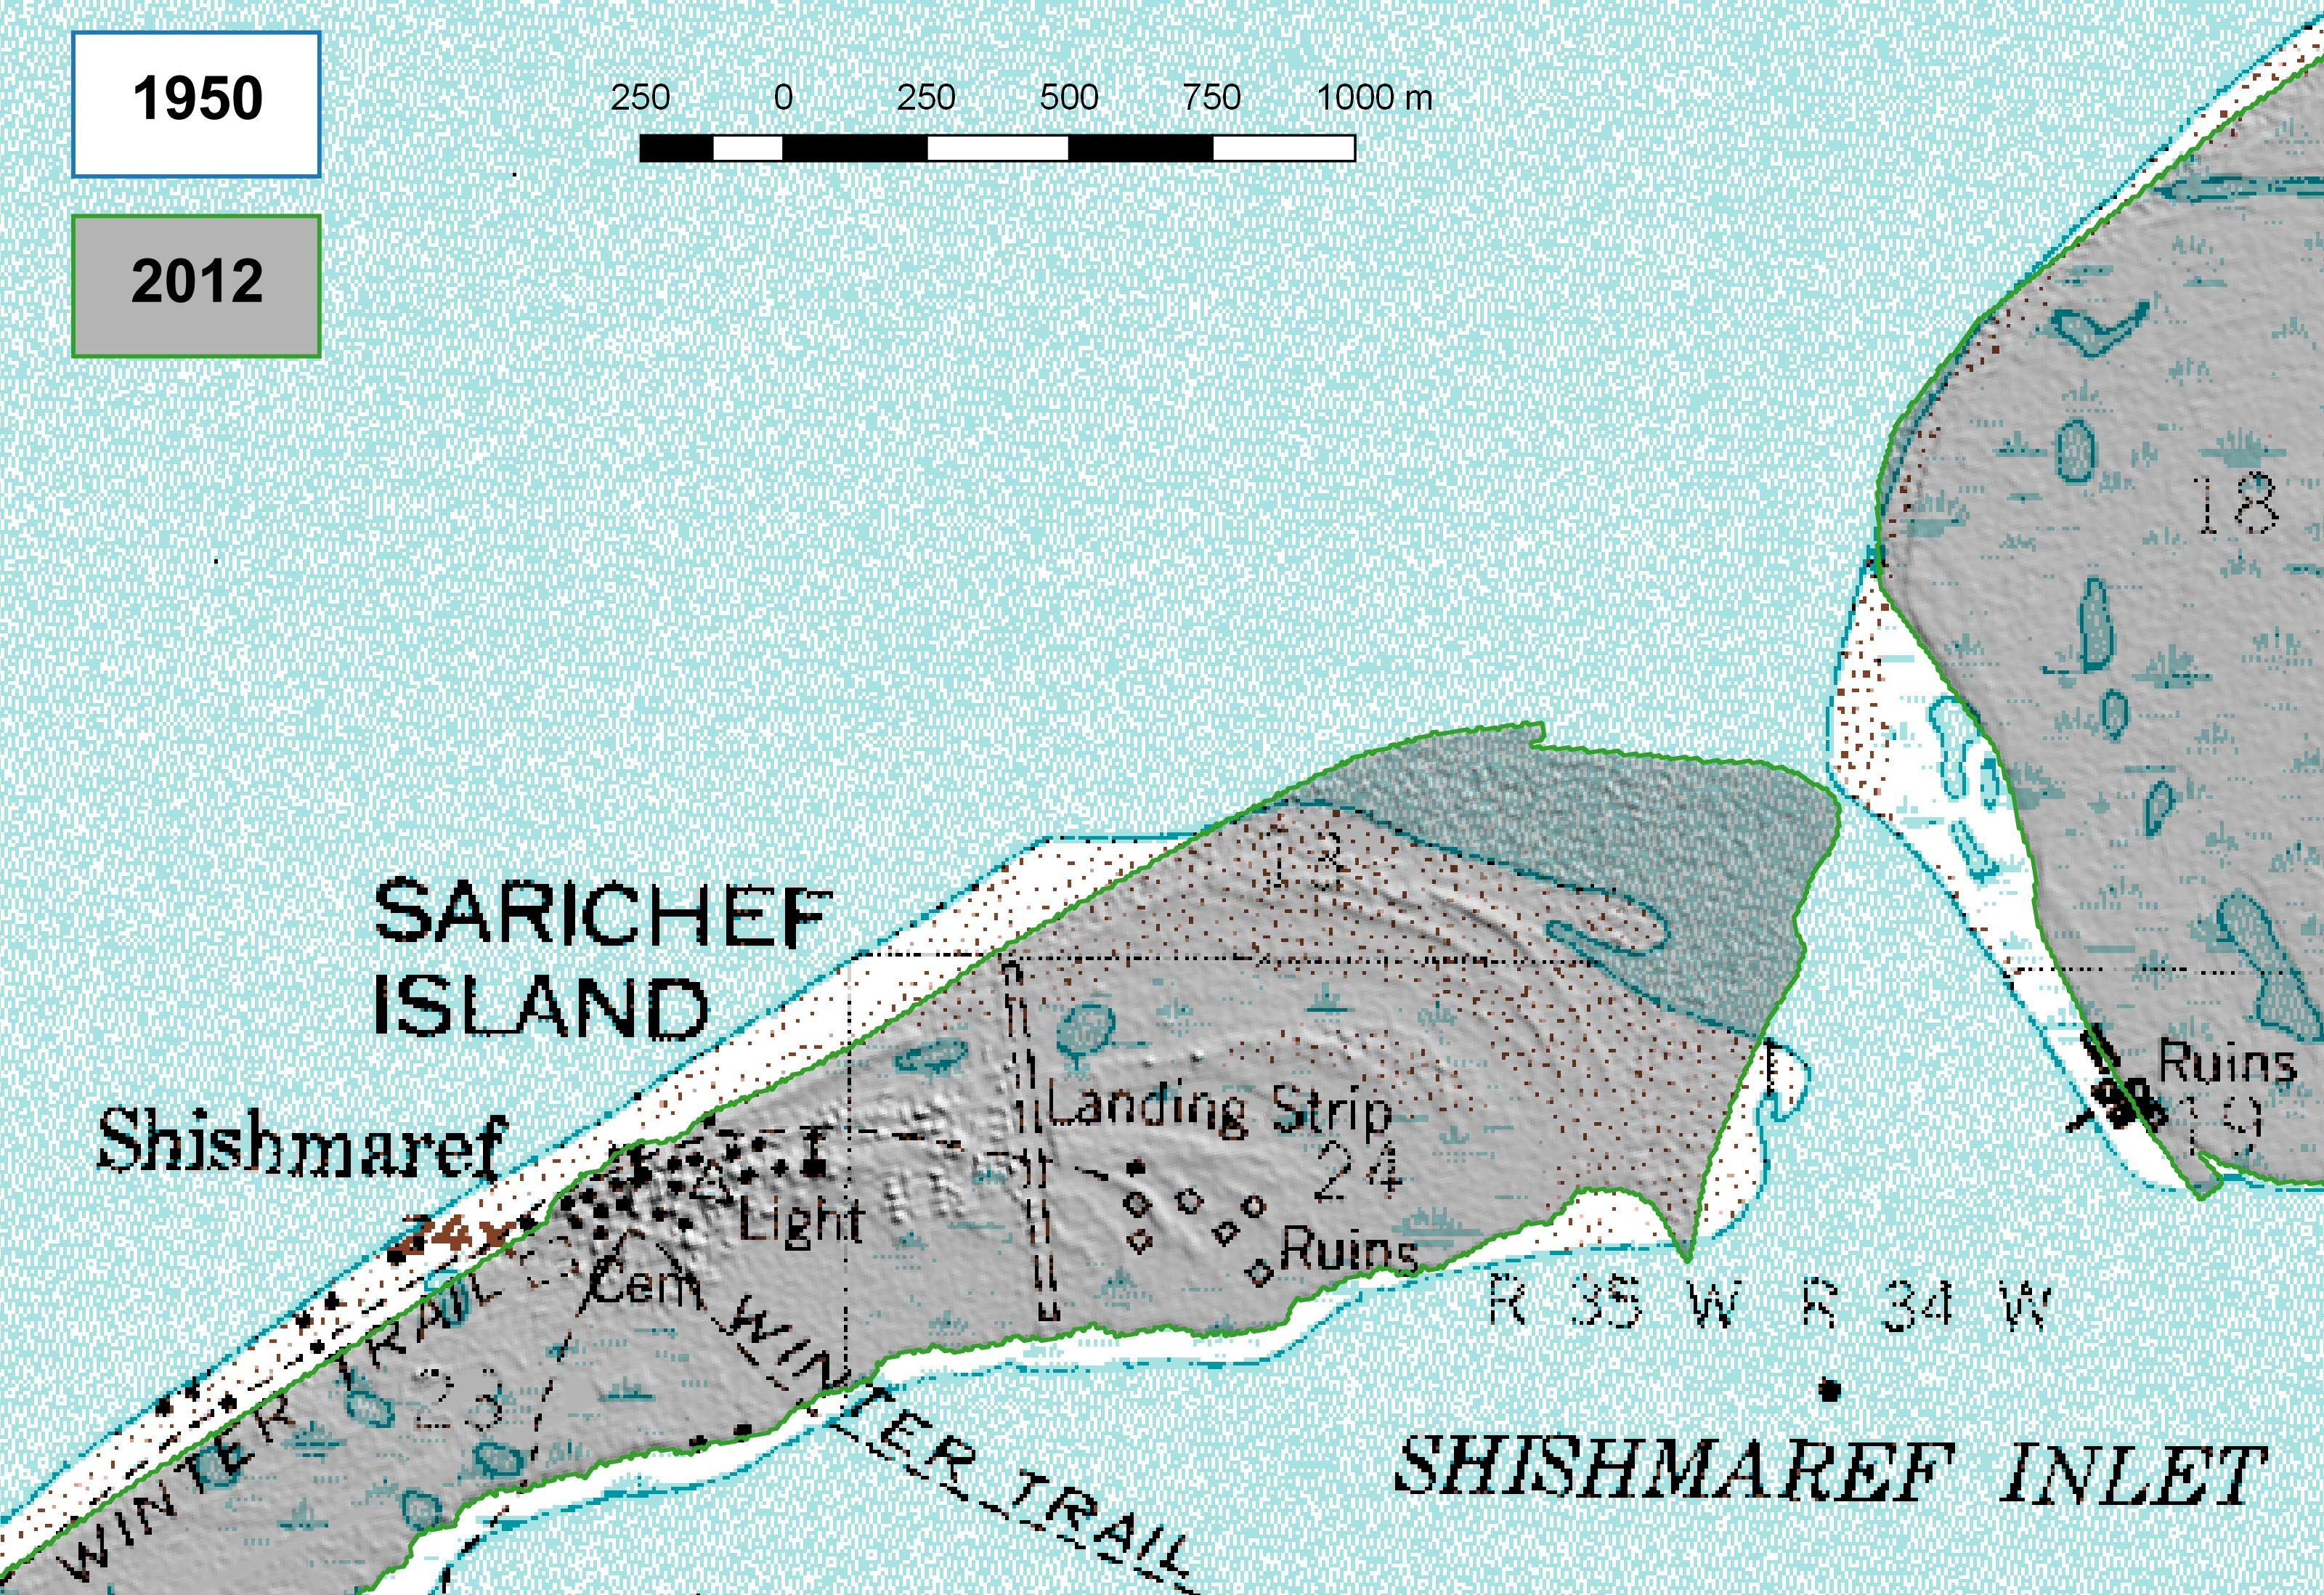 File:Shishmaref 1950-2012 grey detail.jpg - Wikimedia Commons